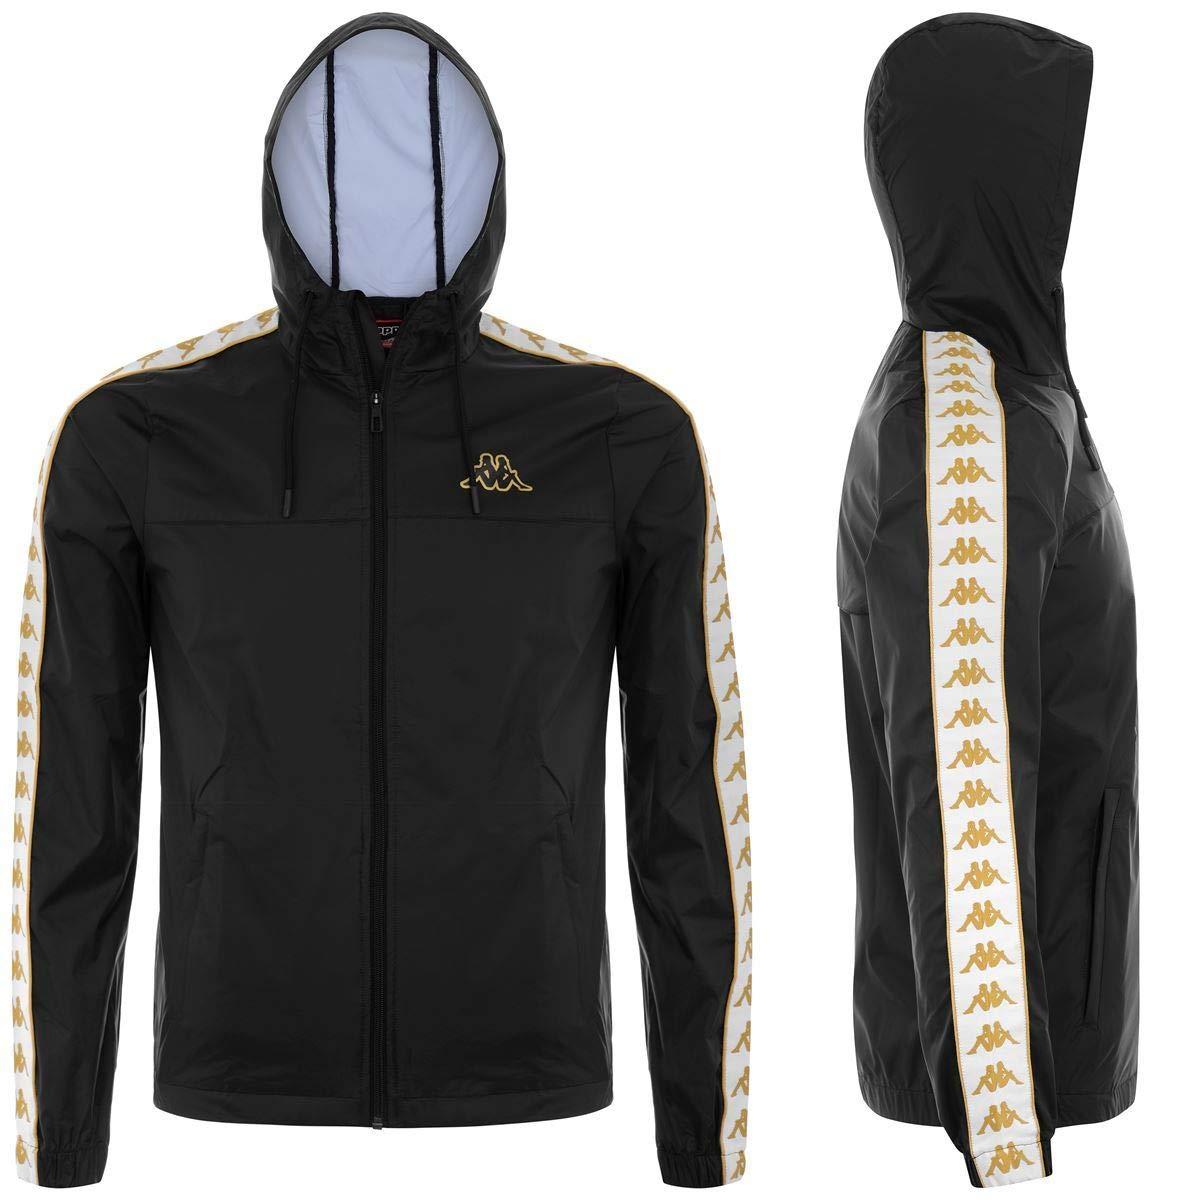 4efa915d38 Kappa 222 Banda Dawson Men Hoodie Jacket - Black/White/Gold at ...